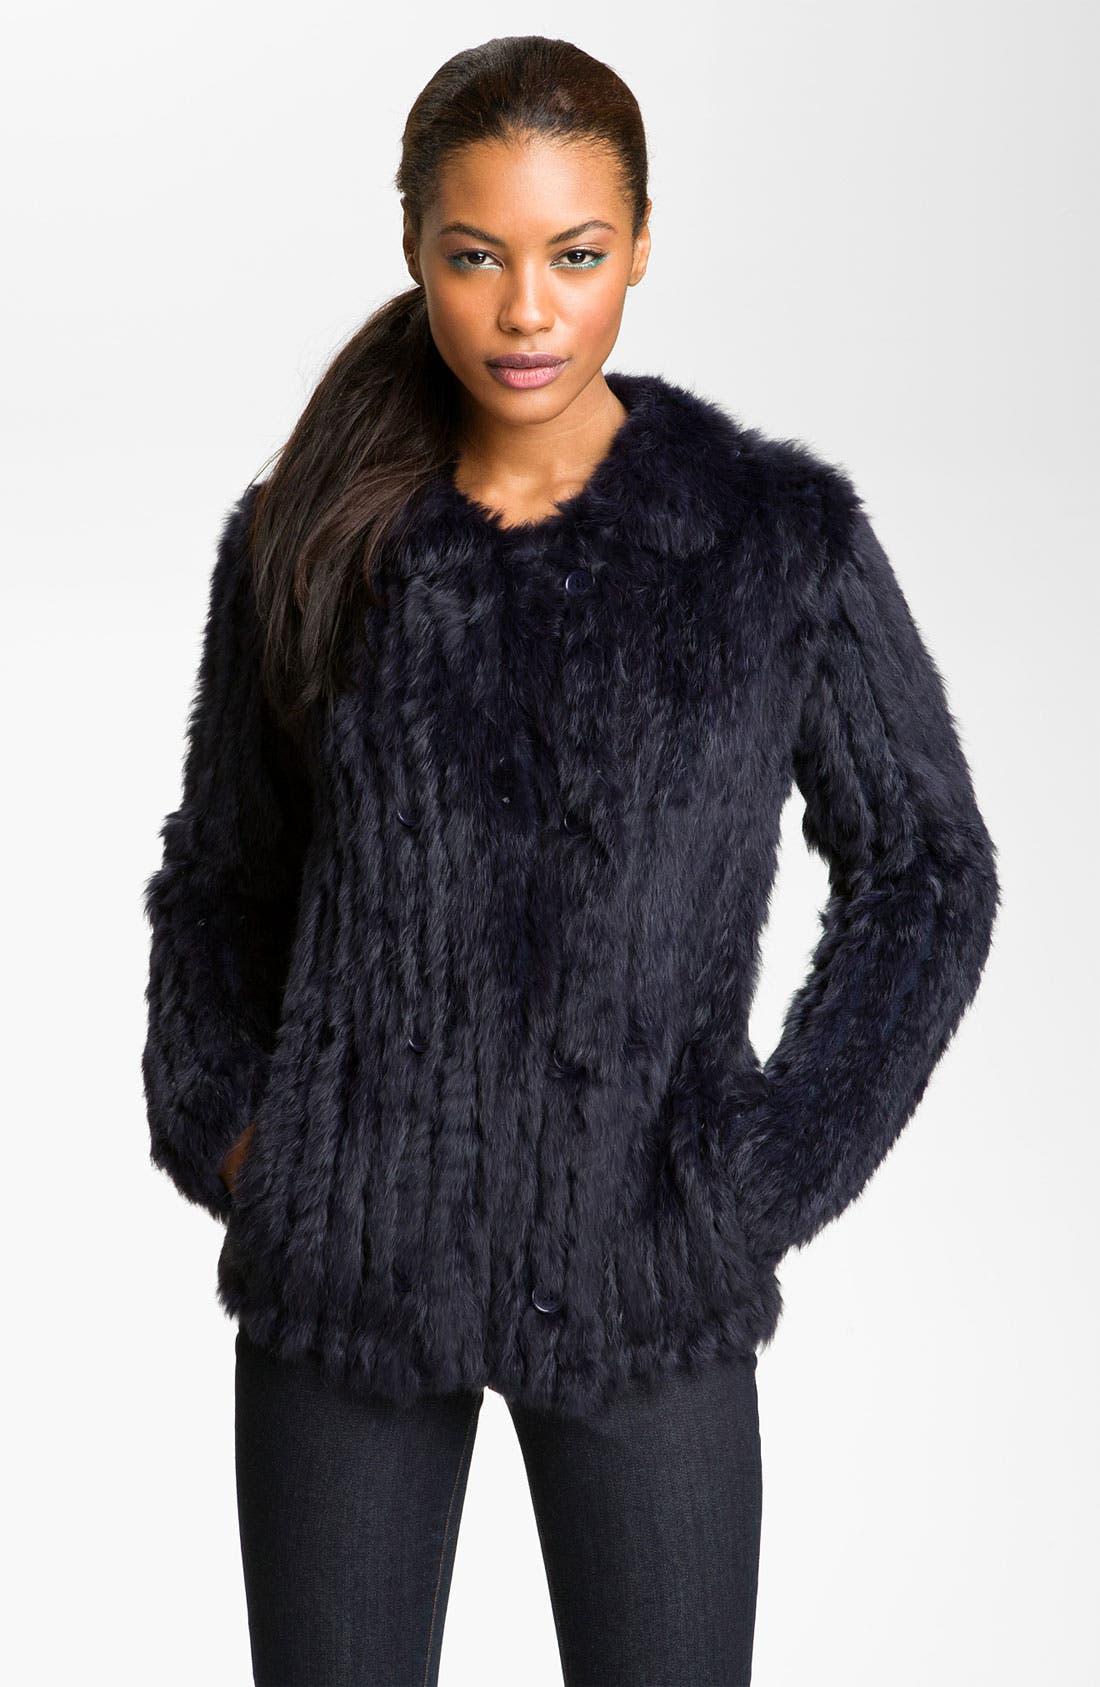 Alternate Image 1 Selected - MARC BY MARC JACOBS 'Katrina' Genuine Rabbit Fur Jacket